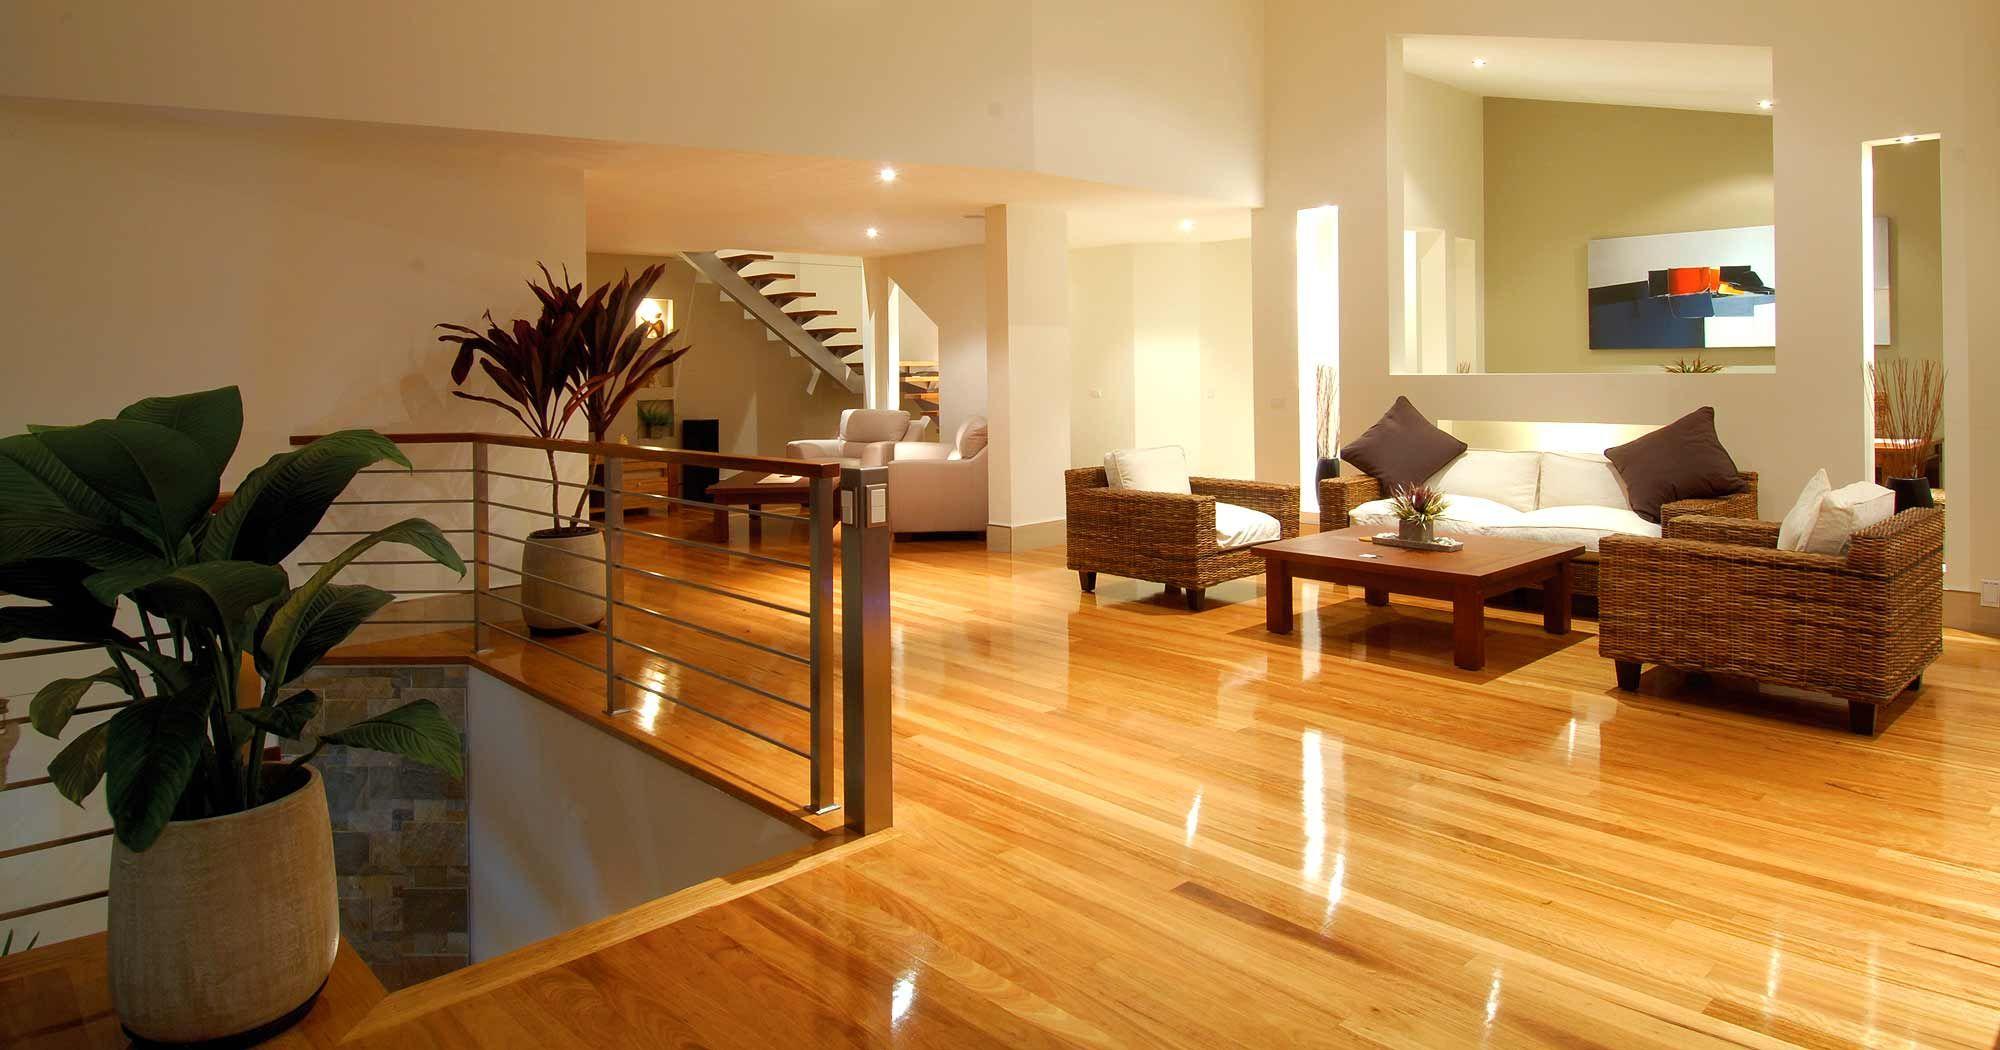 Blackbutt Flooring Timber flooring melbourne, Waterproof